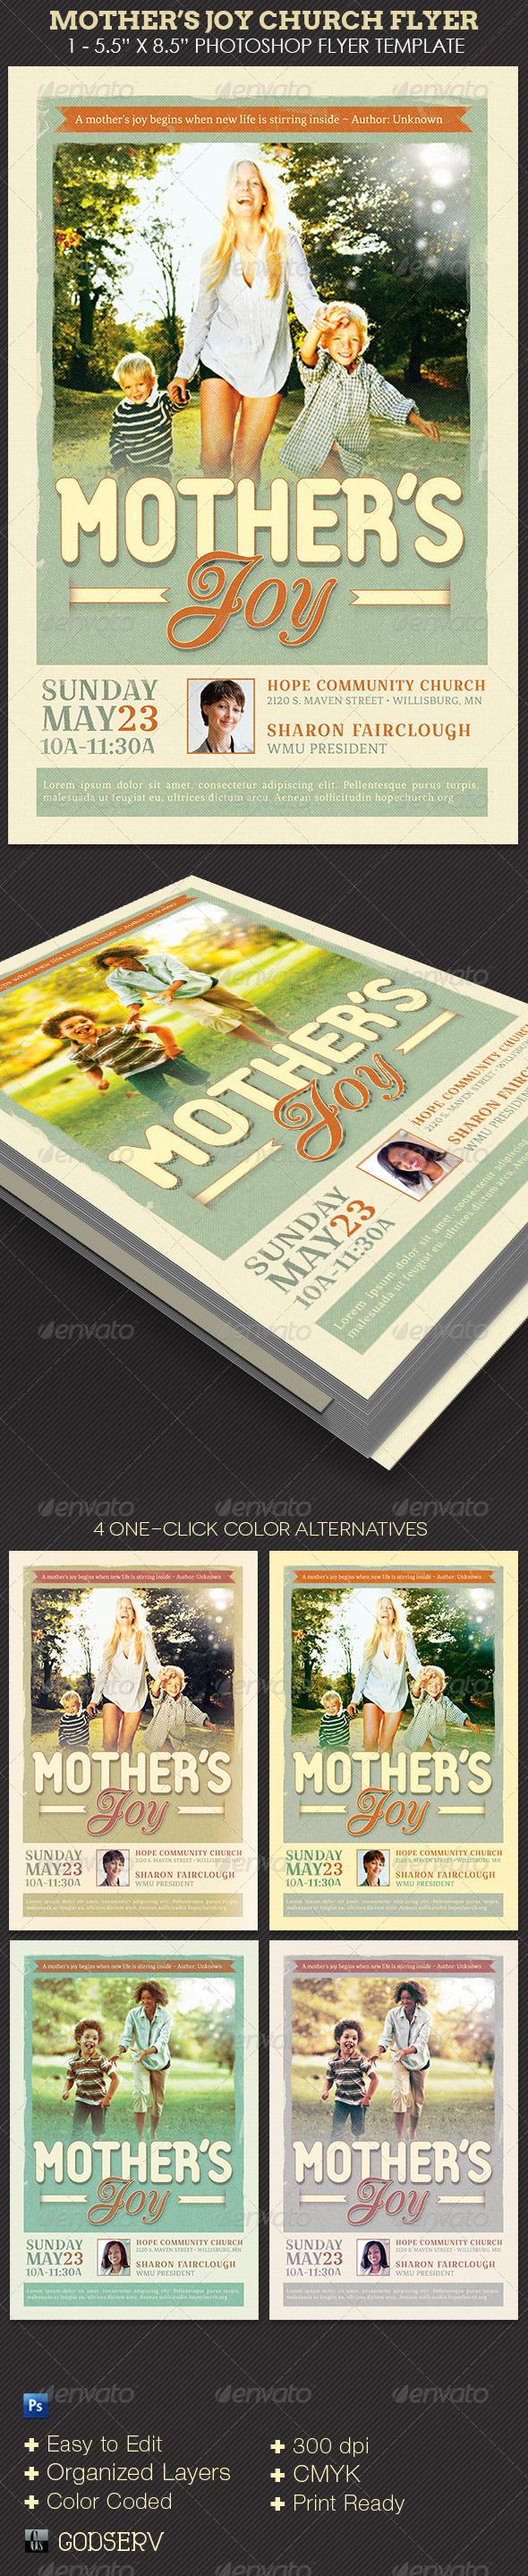 Mother's Joy Church Flyer Template - Church Flyers